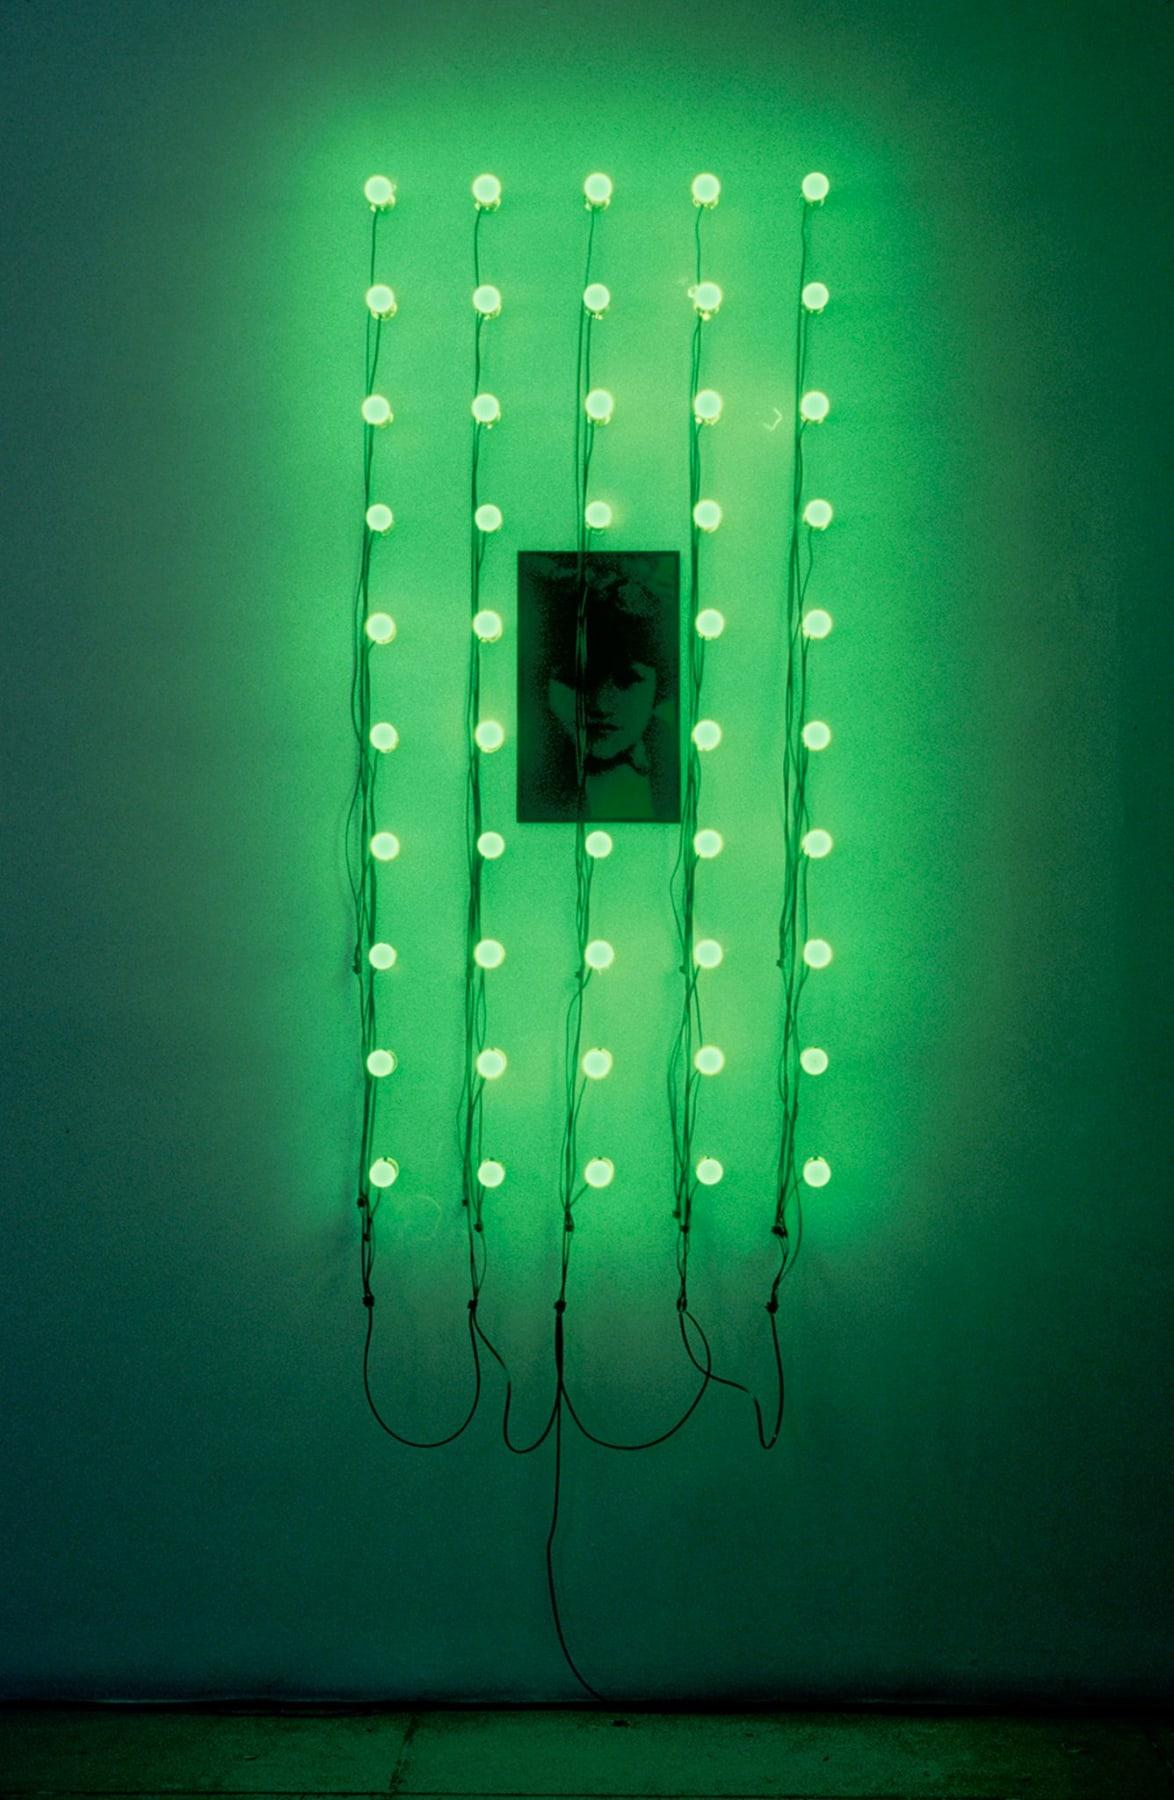 Christian Boltanski, Lumieres (Catherine), 2000